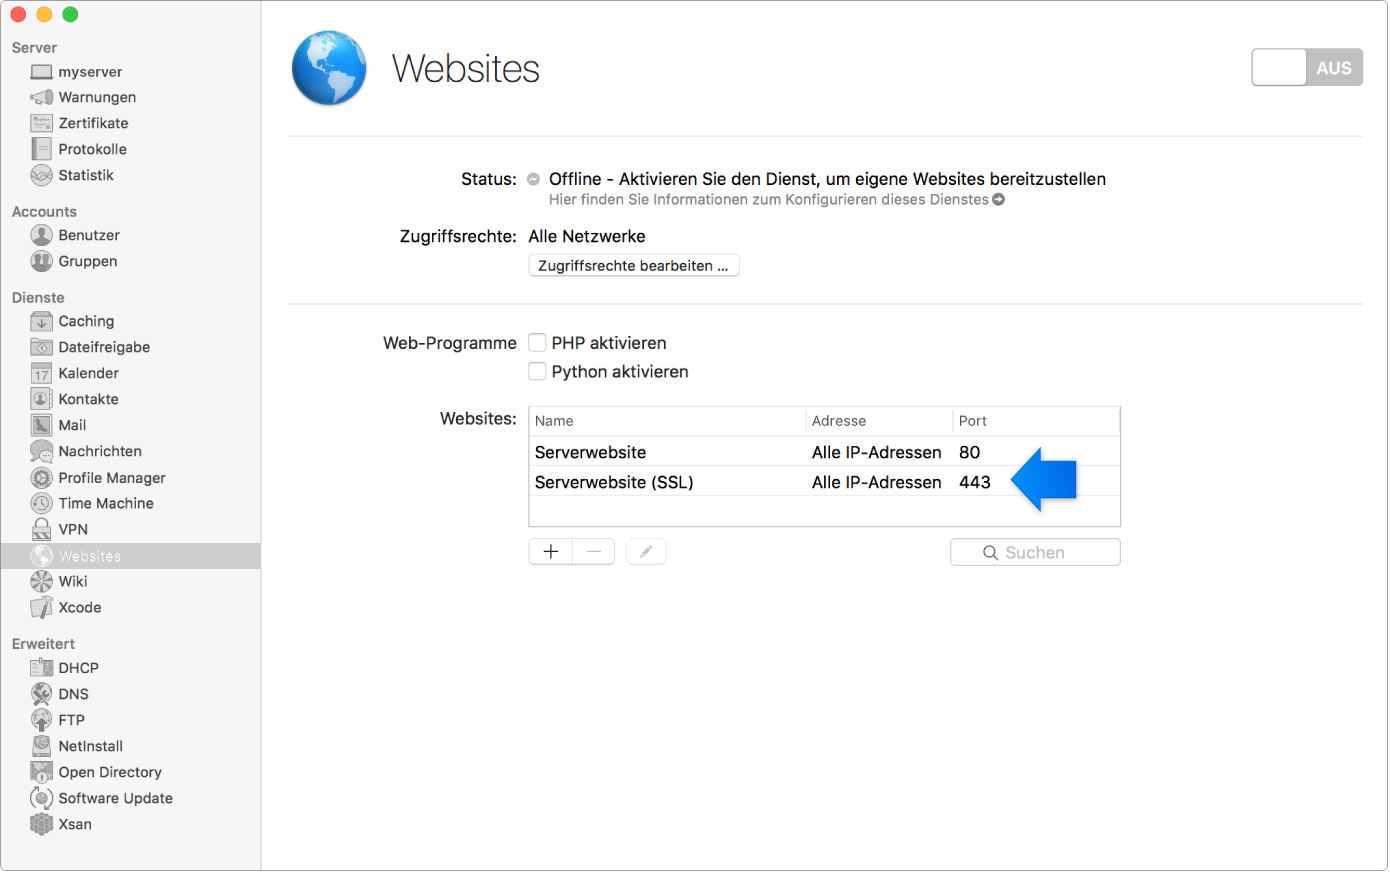 SSL-Standardwebsite ausgewählt